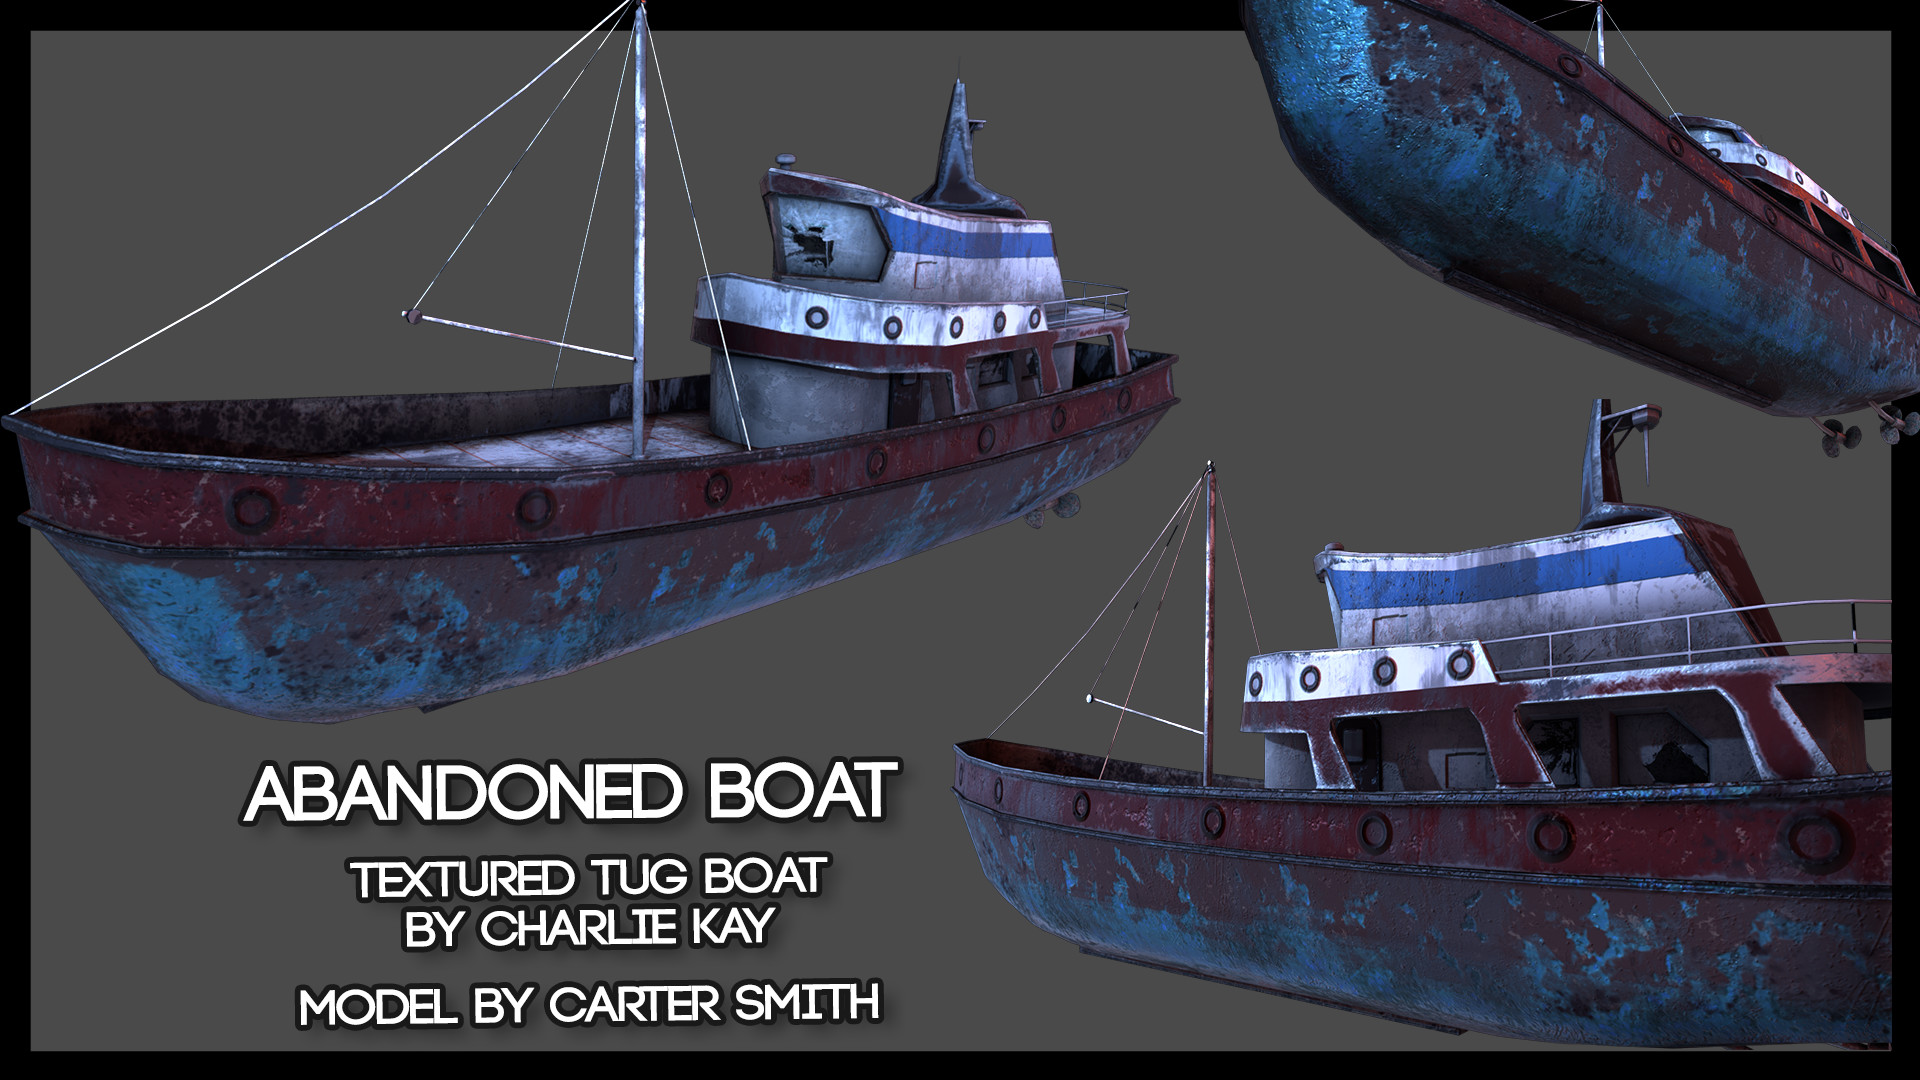 Charlie kay tug boat